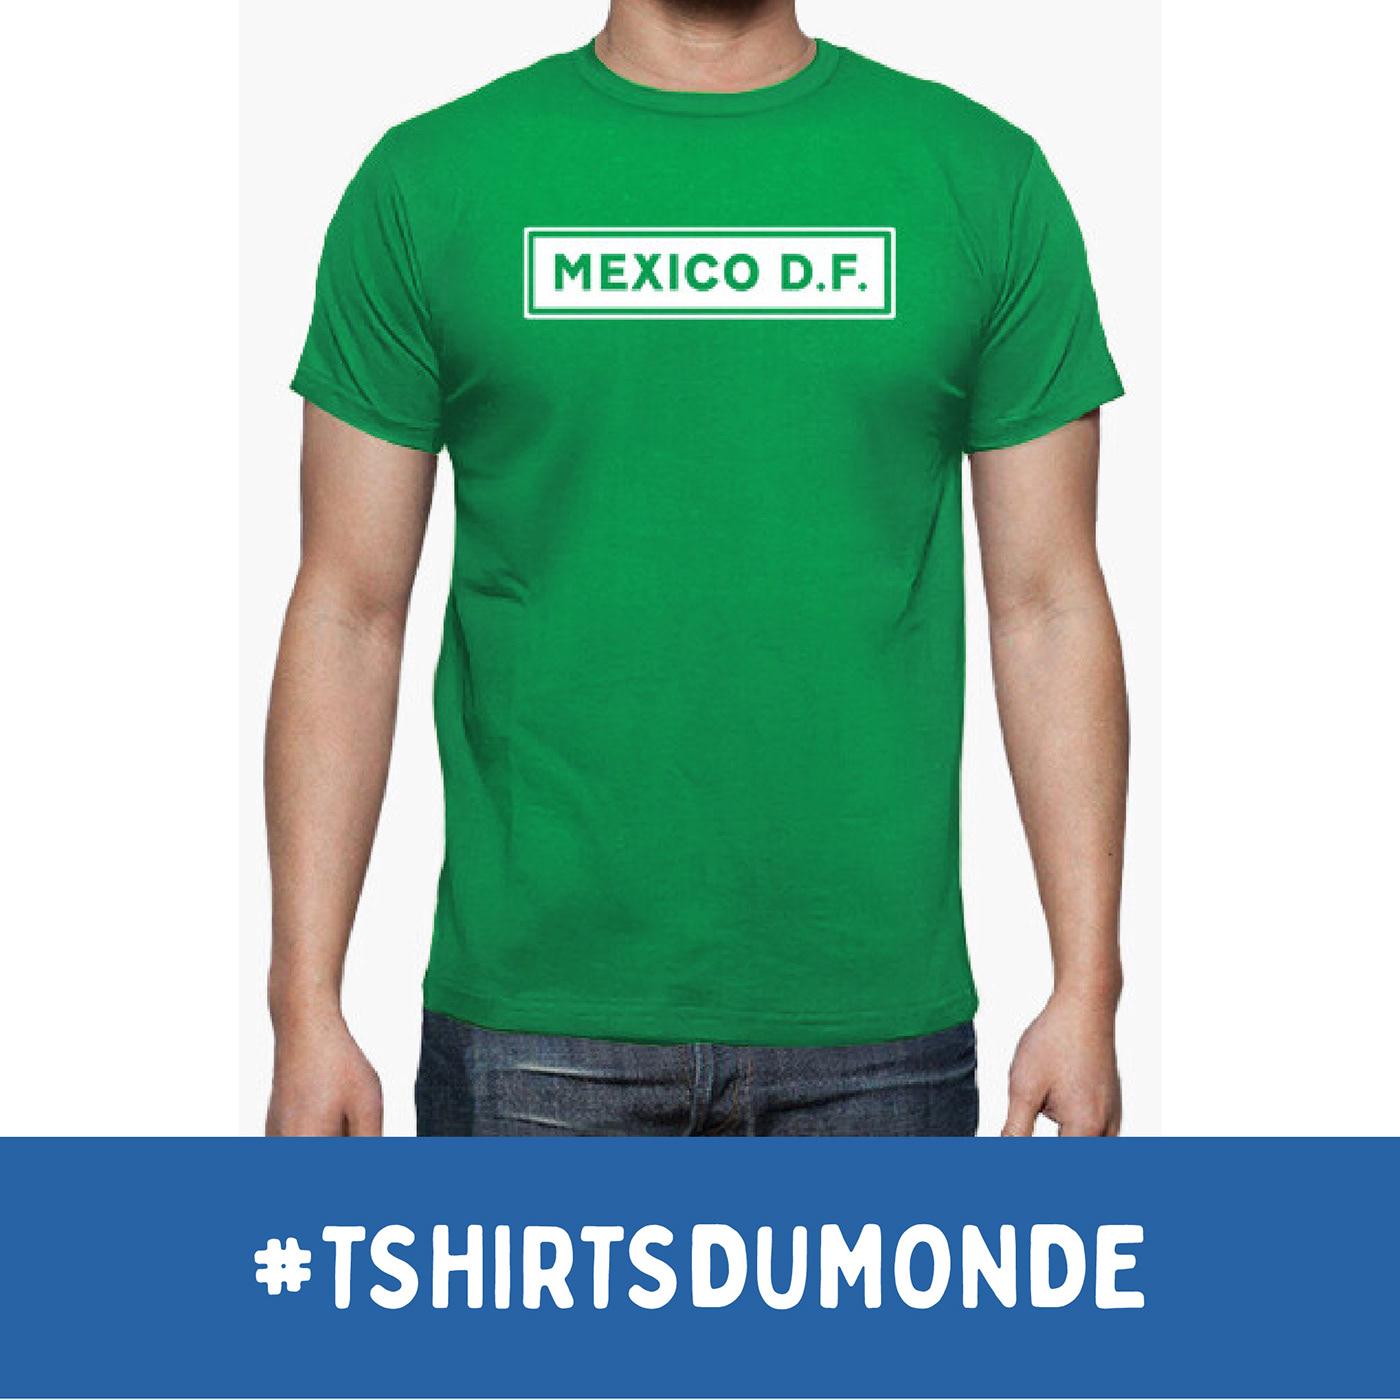 MEXICO D.F. / T-SHIRTS DU MONDE Collection, by Brassens Studio / ©Tomás Sastre